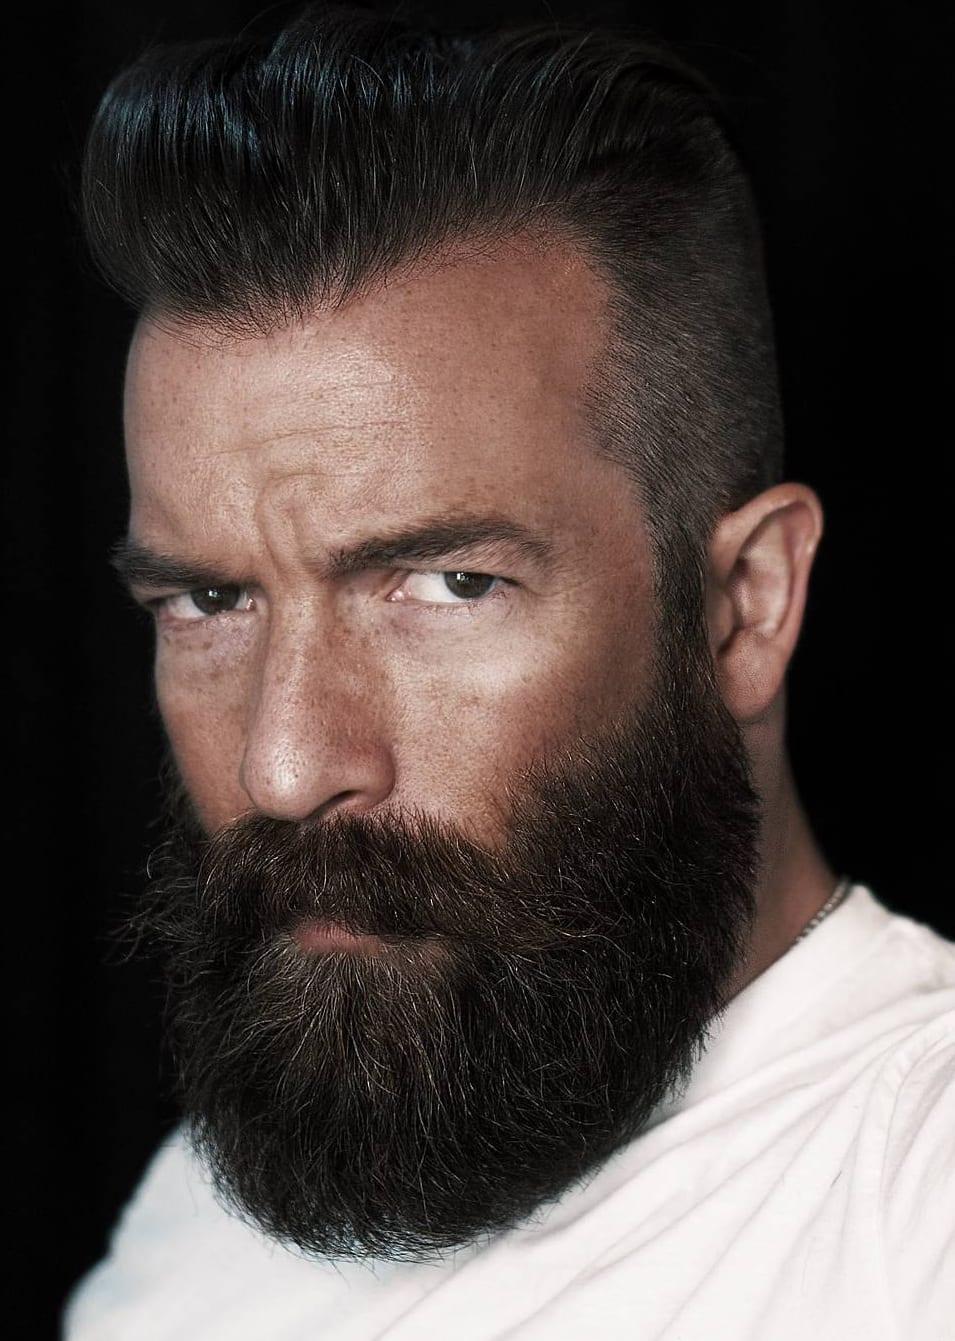 Beard Grooming Guide For Men In 2019.